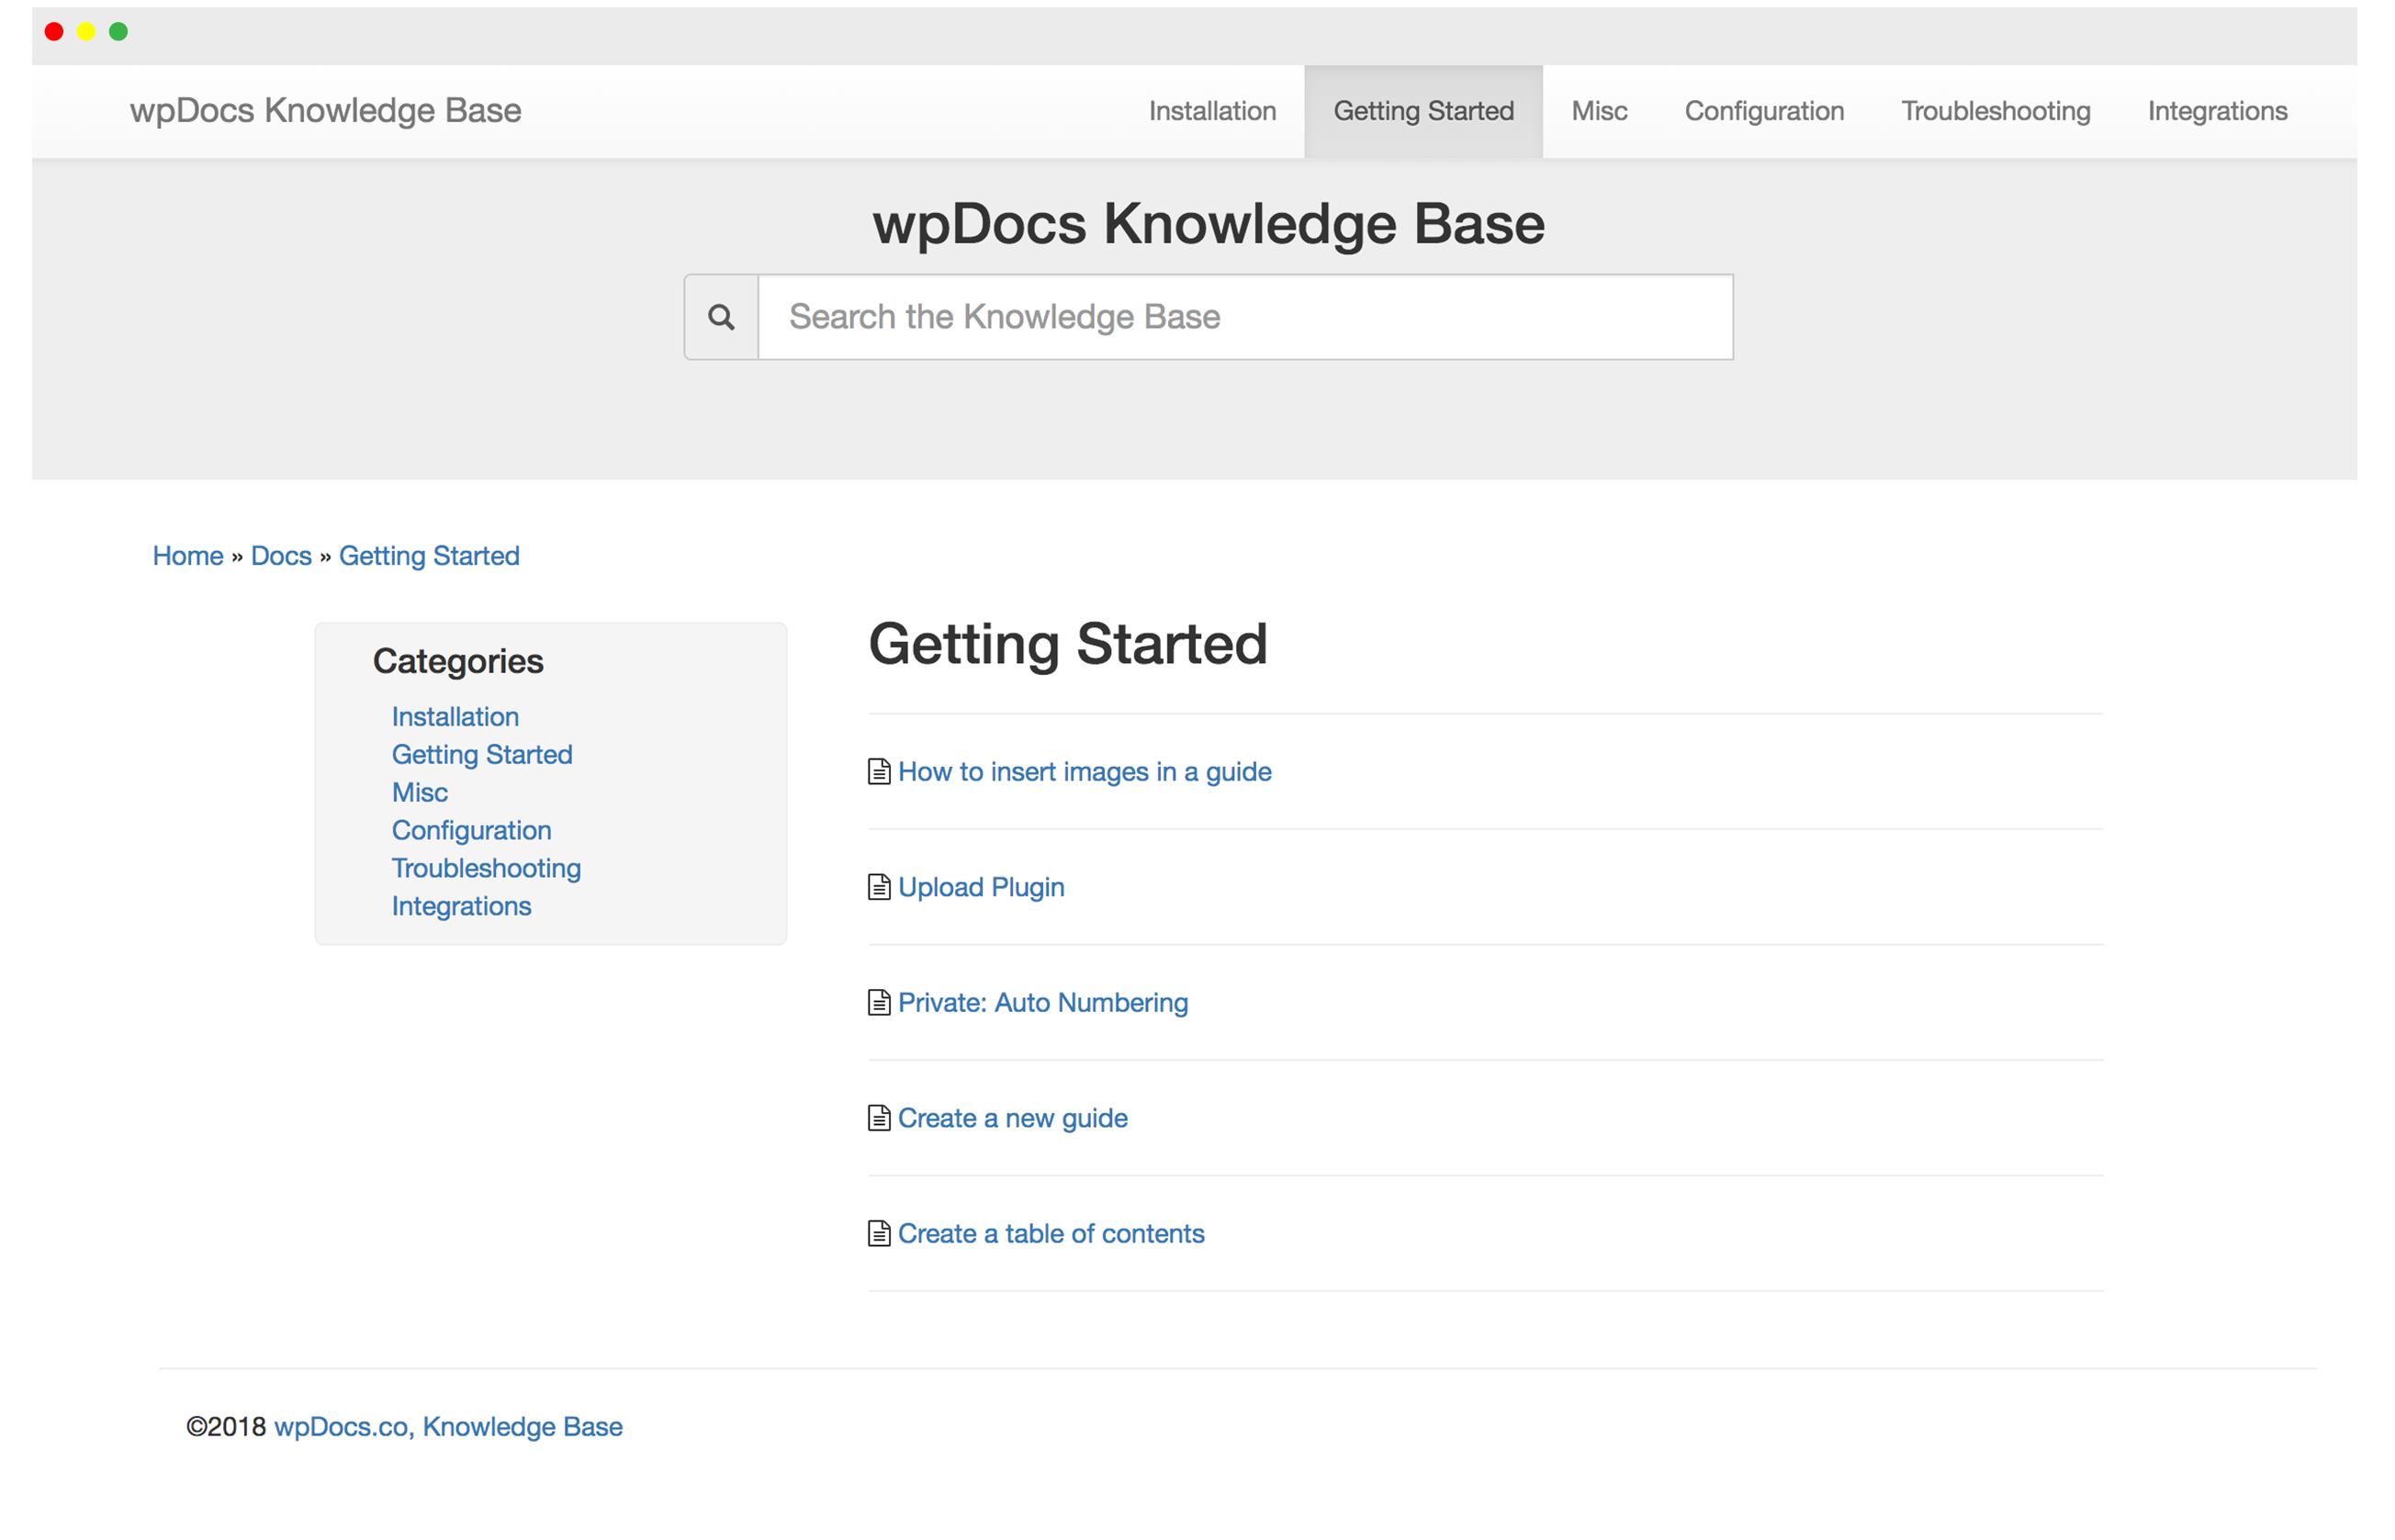 Wordpress Knowledge Base Software | WP Docs